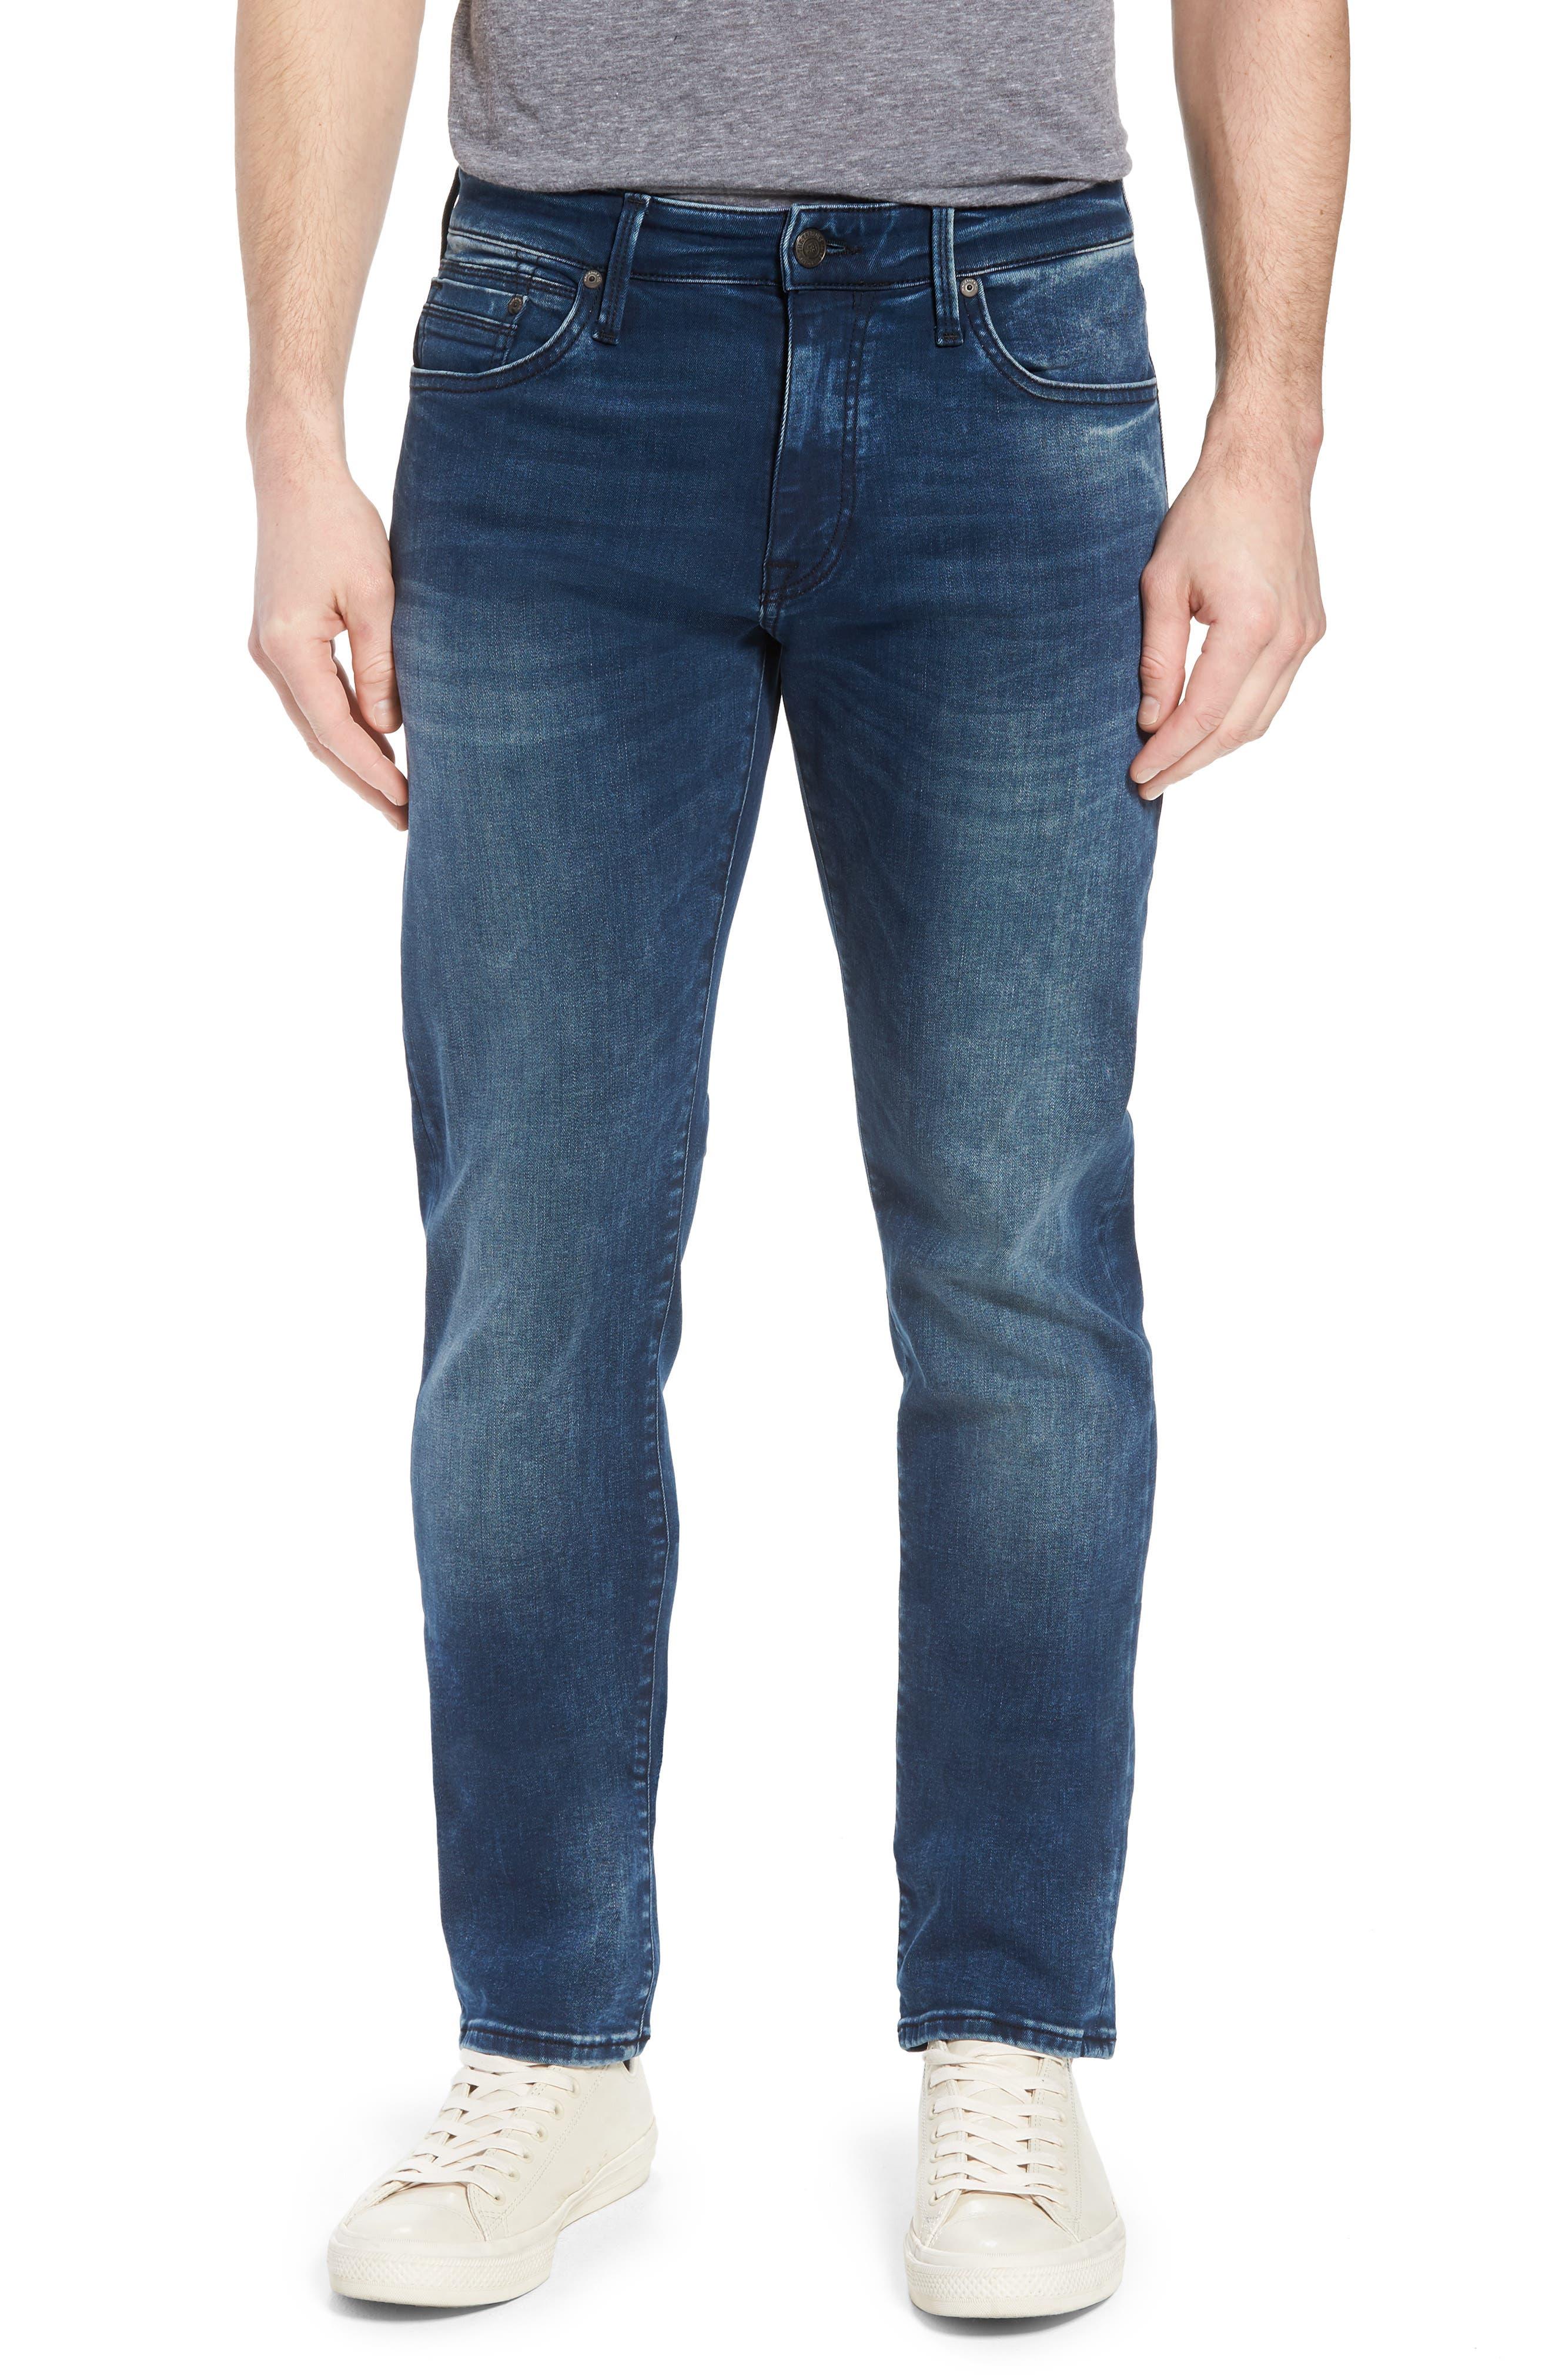 Marcus Slim Straight Leg Jeans,                             Main thumbnail 1, color,                             Forest Blue Williamsburg